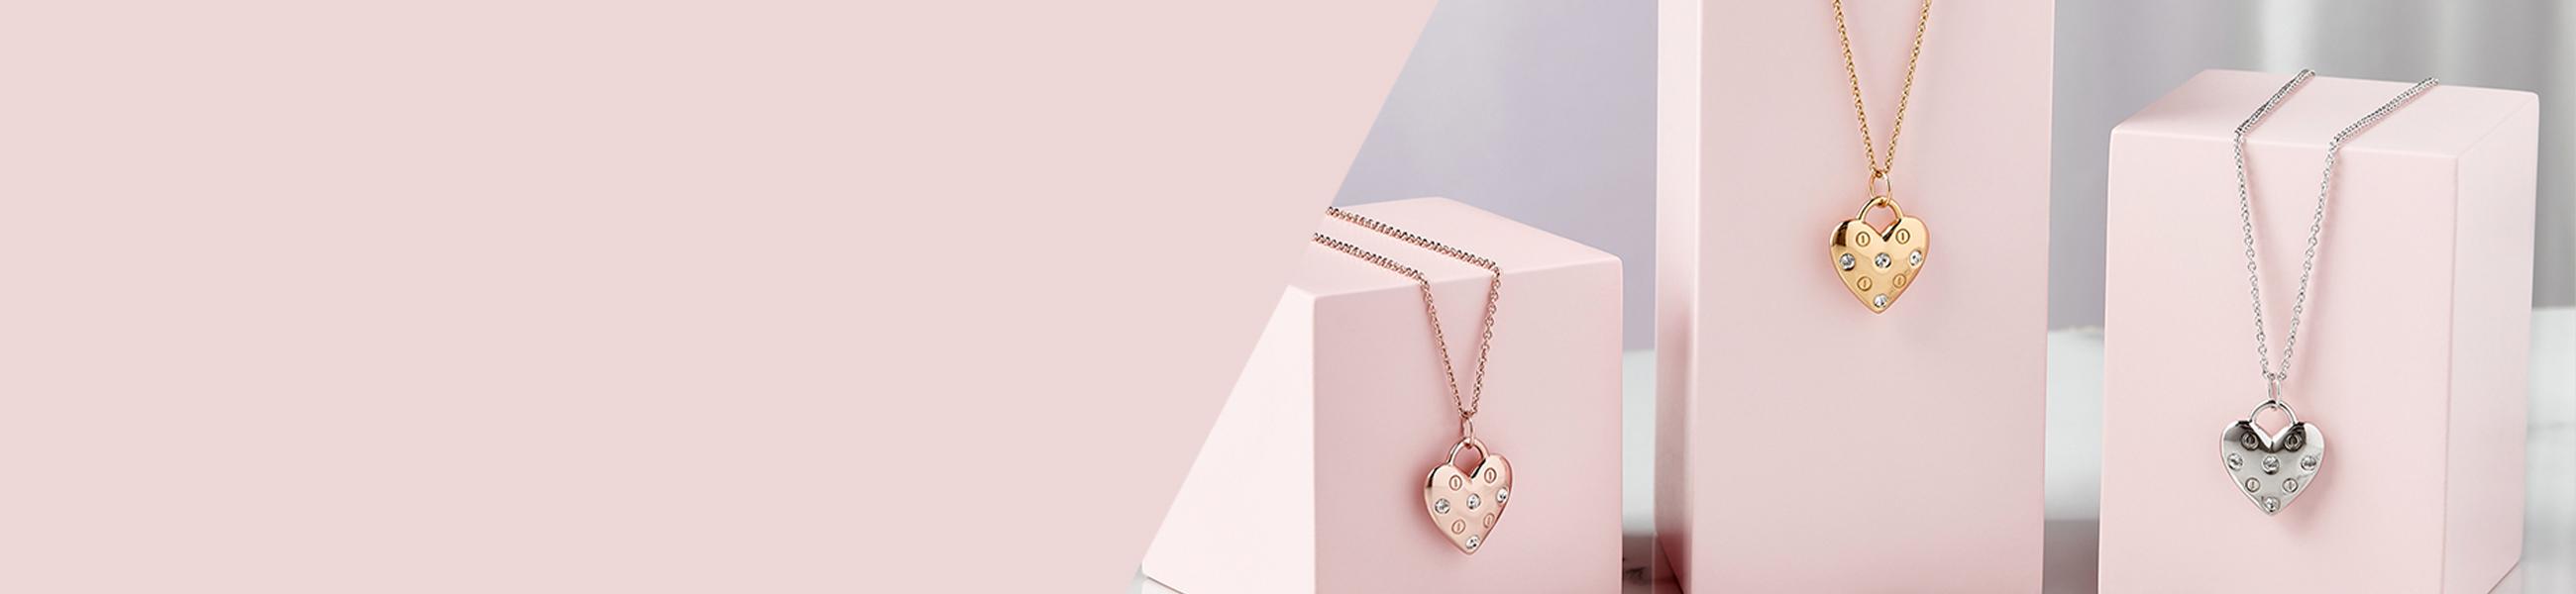 Crystal Embellished Jewellery